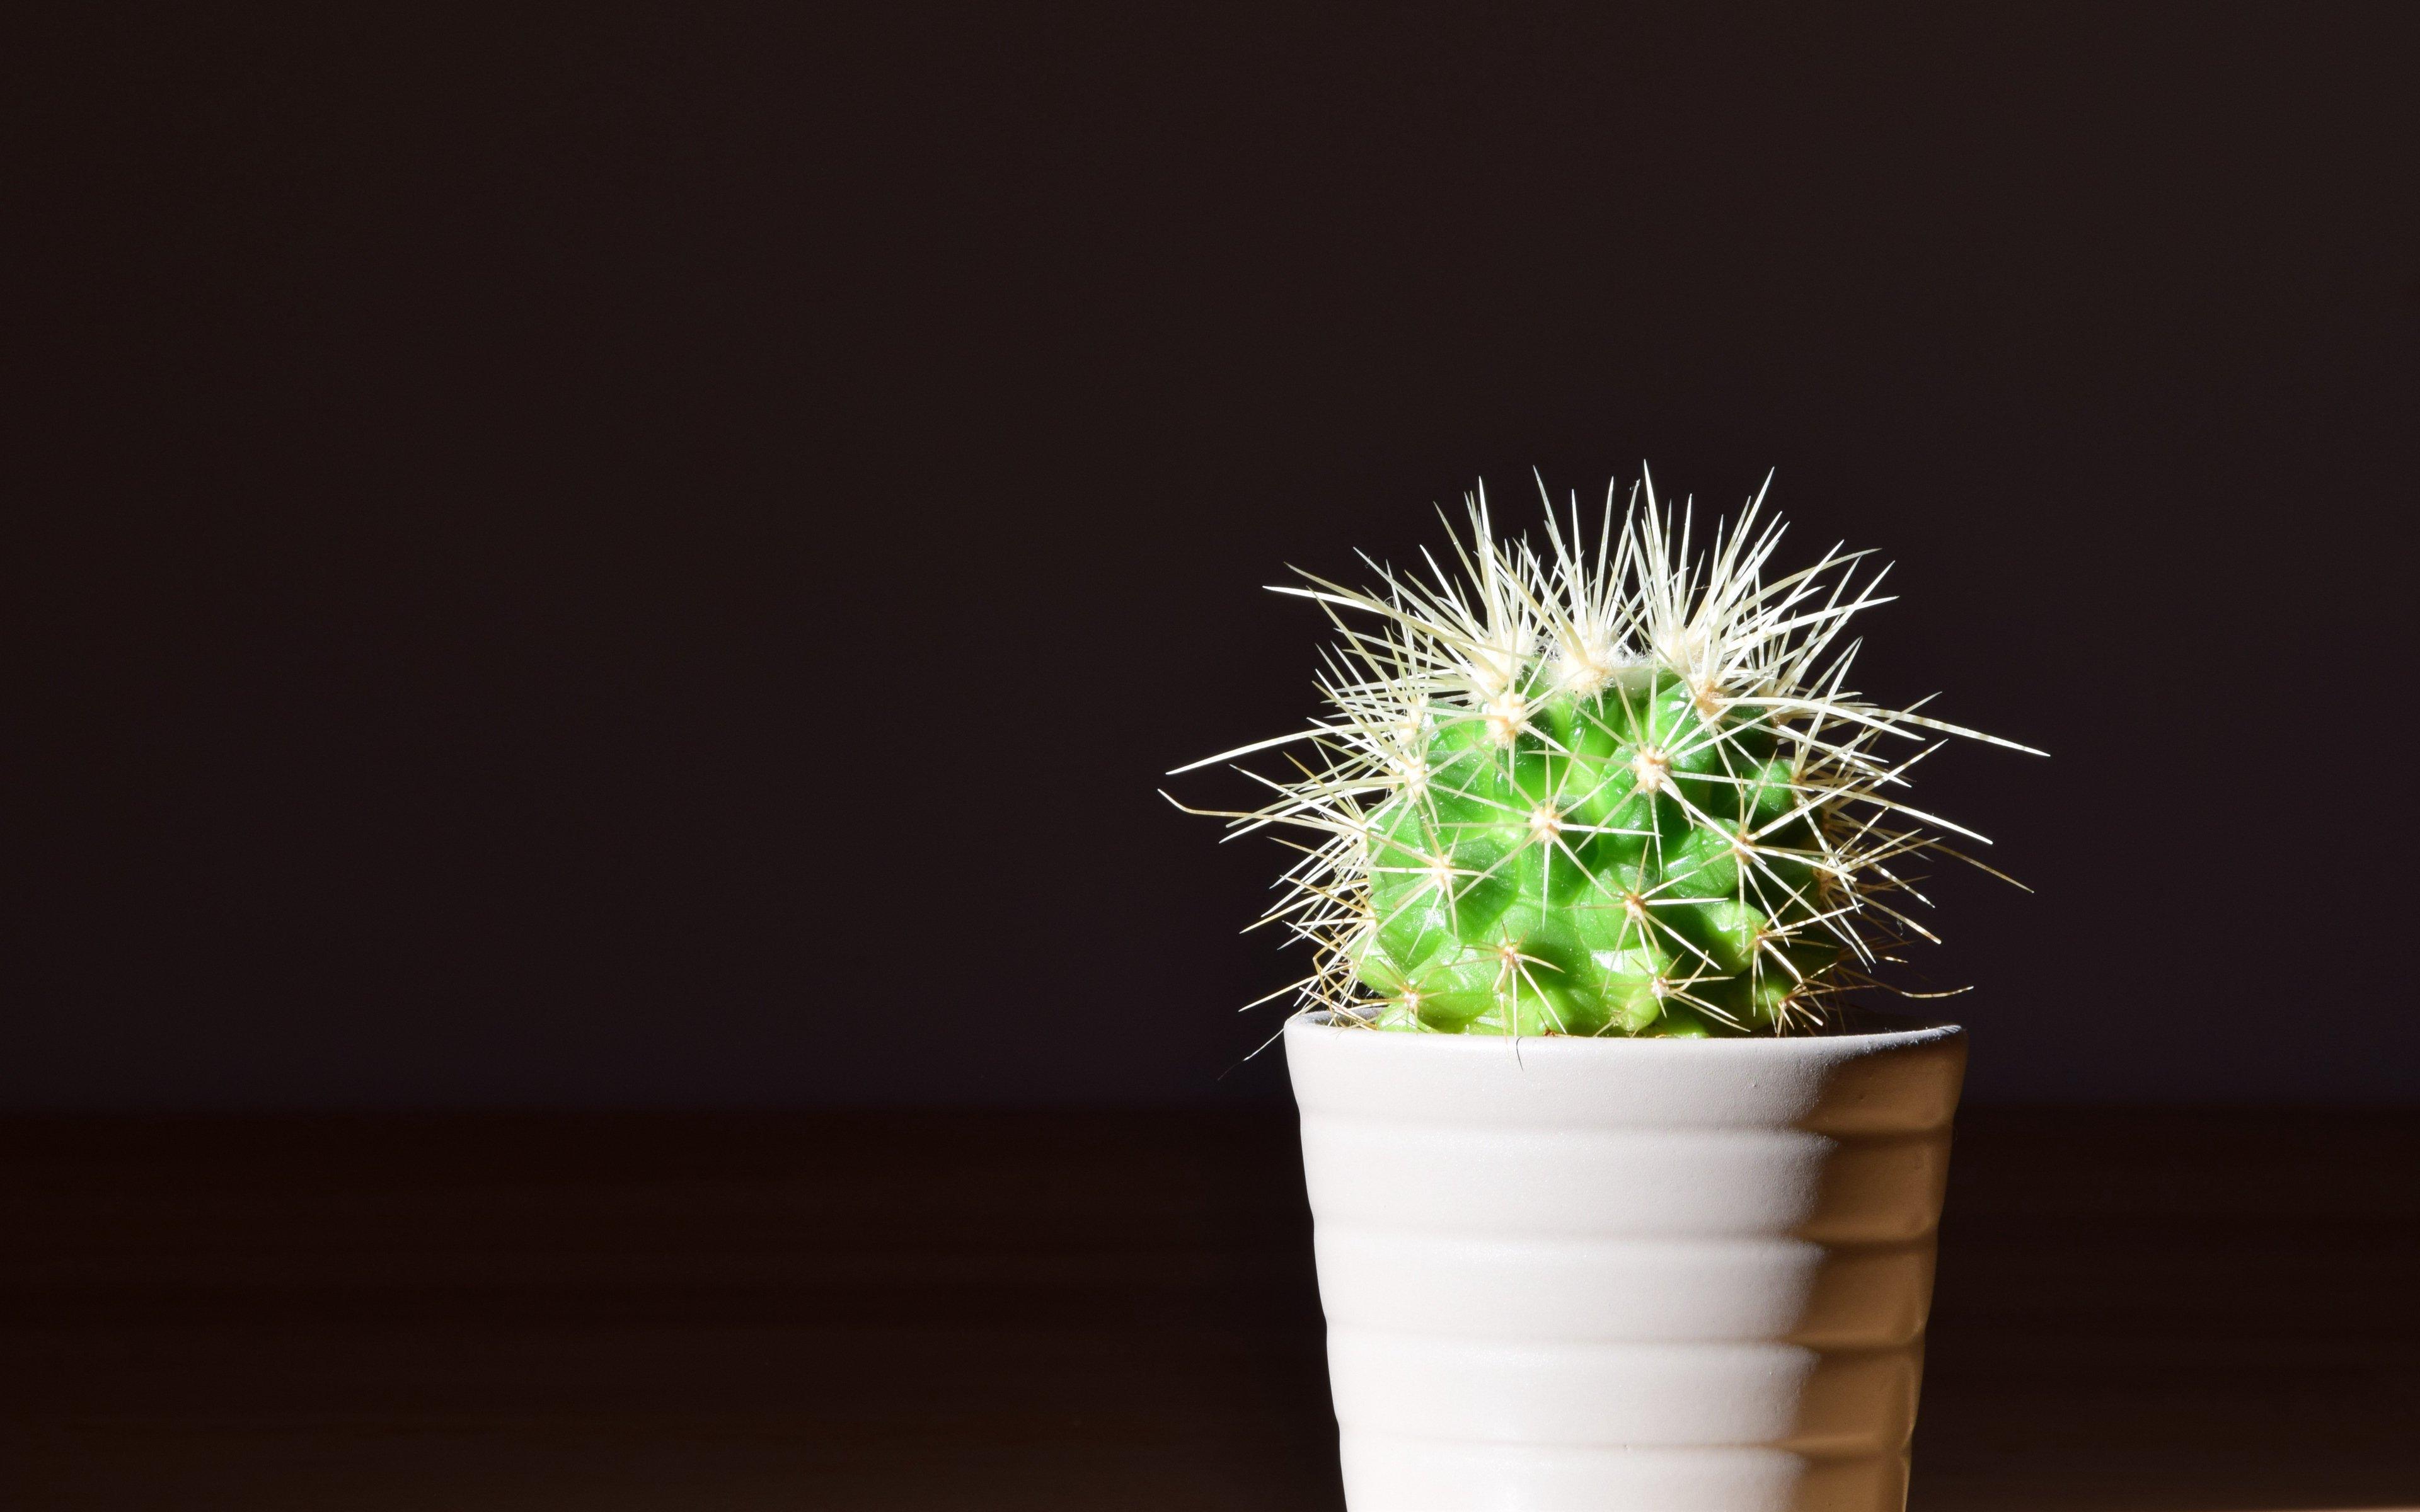 Fondos de pantalla Cactus en maceta